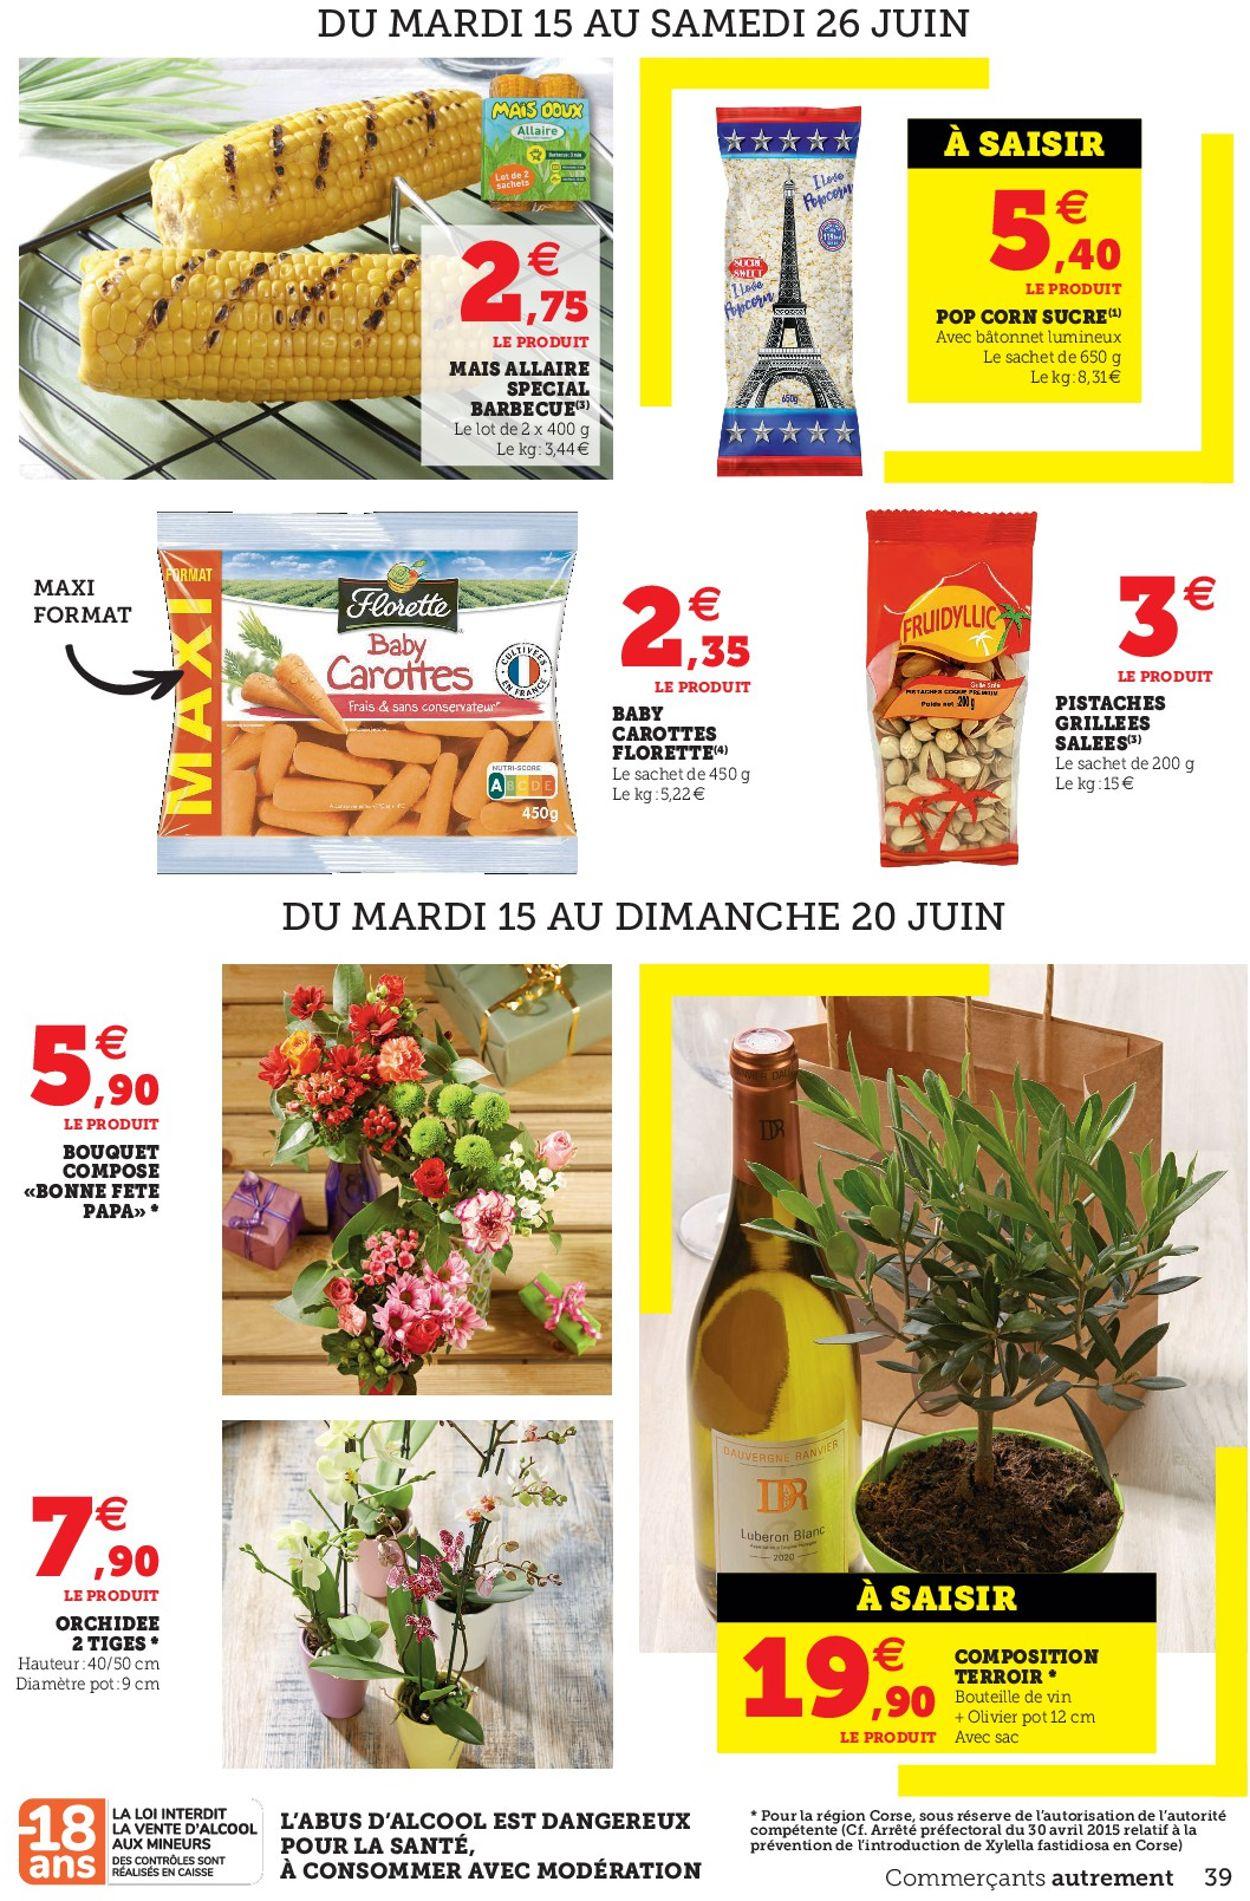 Magasins U Catalogue - 15.06-26.06.2021 (Page 39)